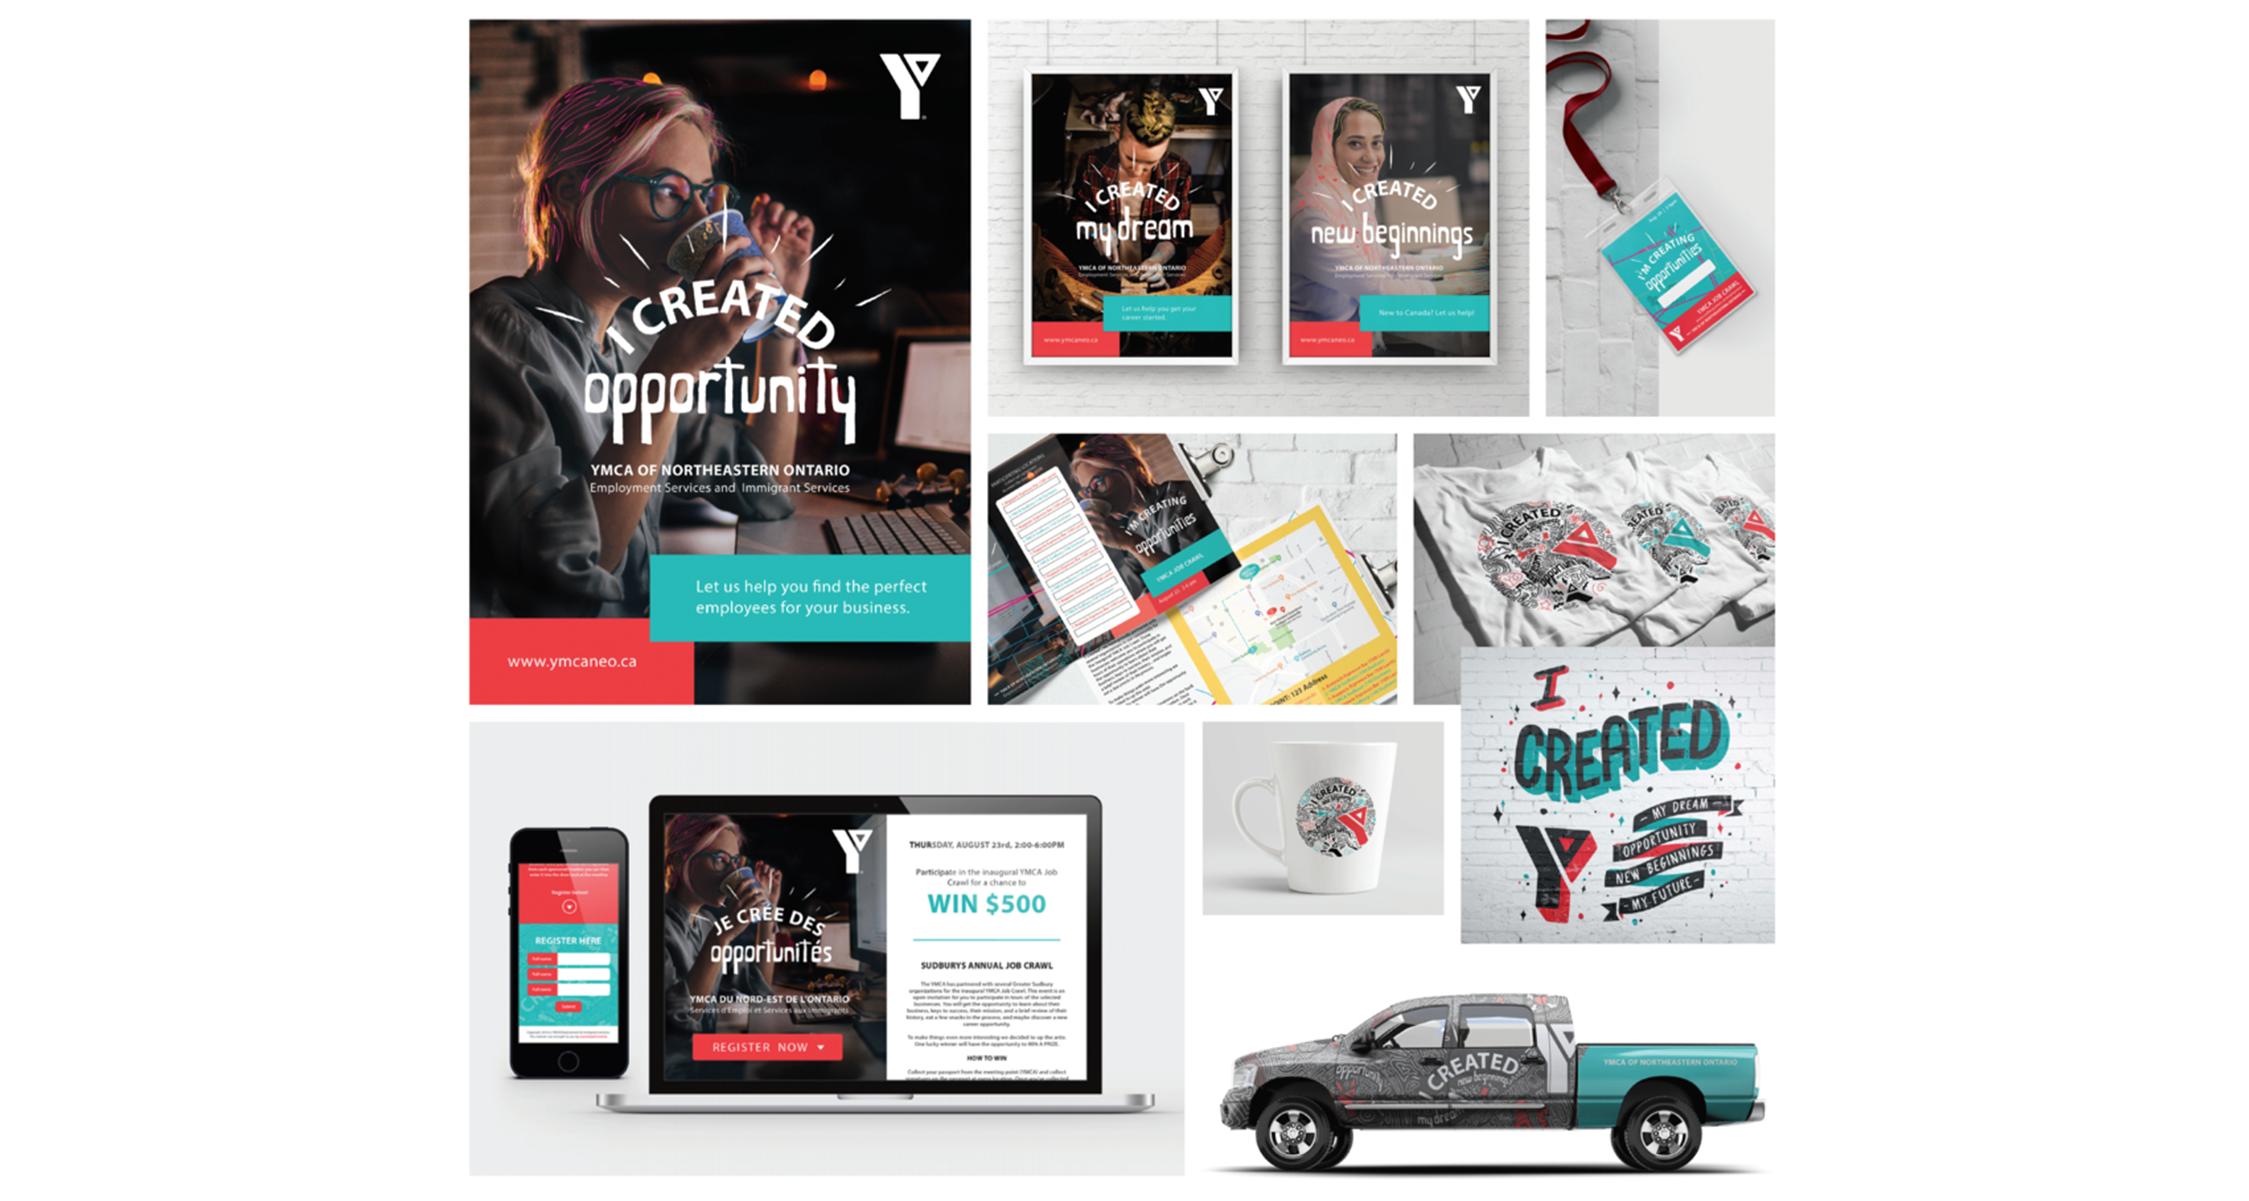 YMCA - Campaign, Events, Print Assets, Digital Assets